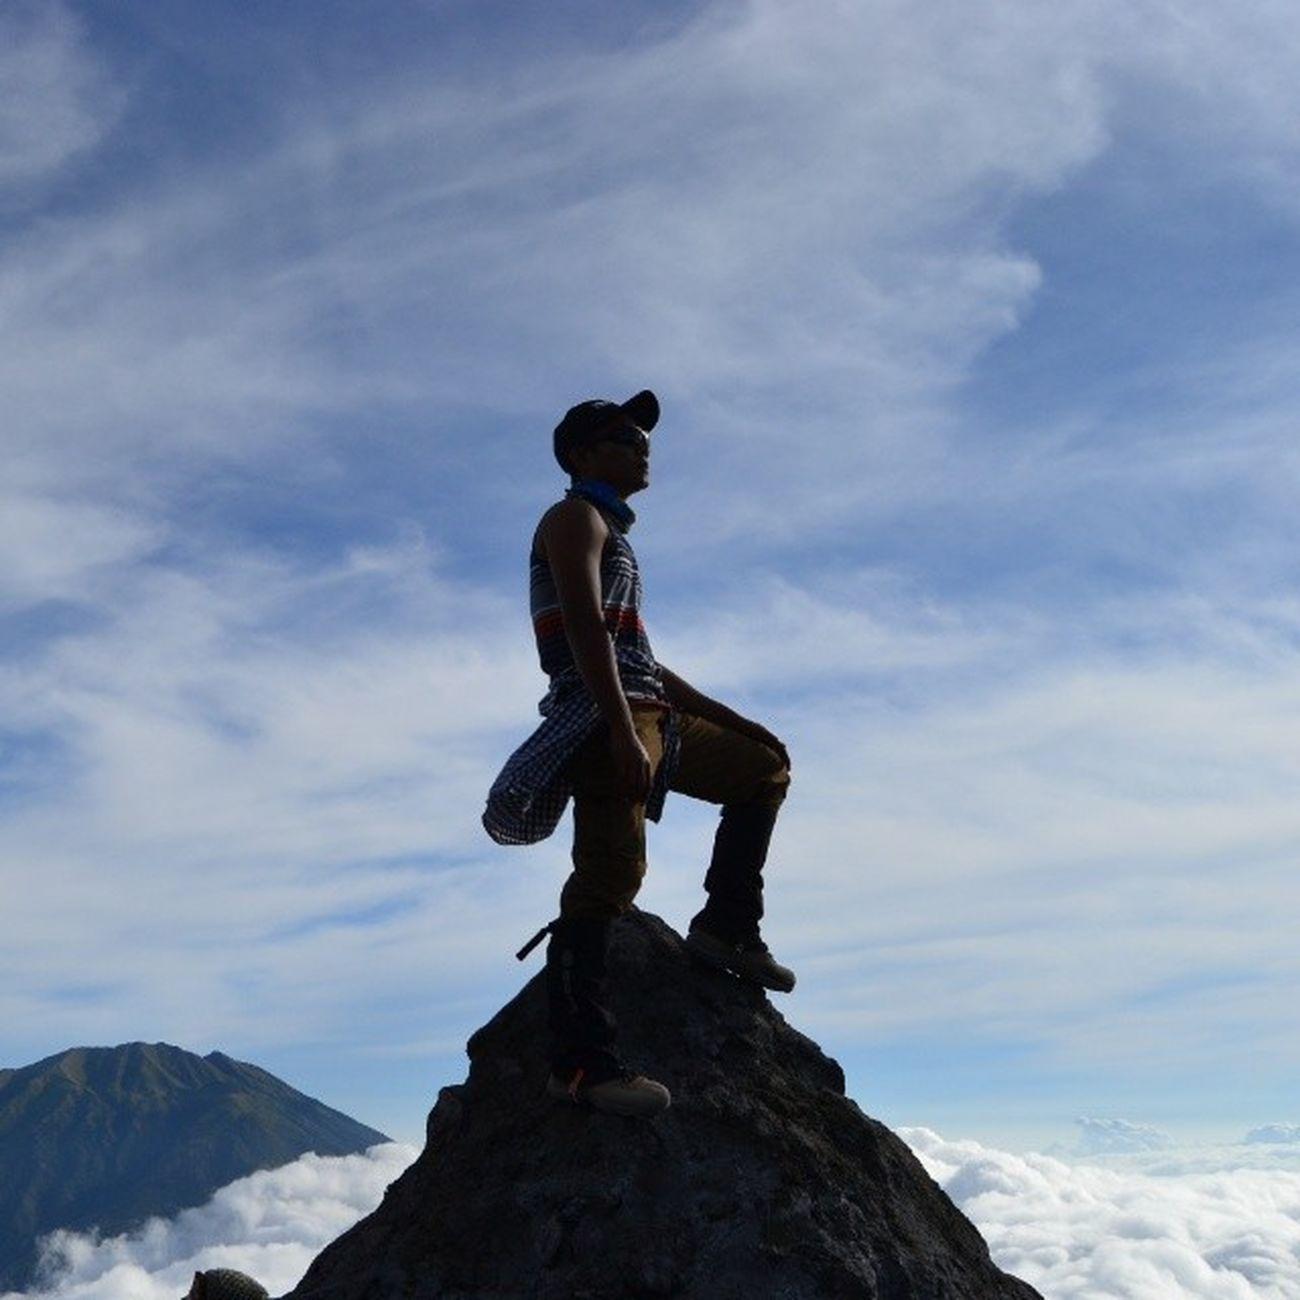 MyAdventure Adventure Allnatureshots Mountainer pendaki skyscraper skyland skyhigh instanusantara indonesia_bagus like4like likeforlike